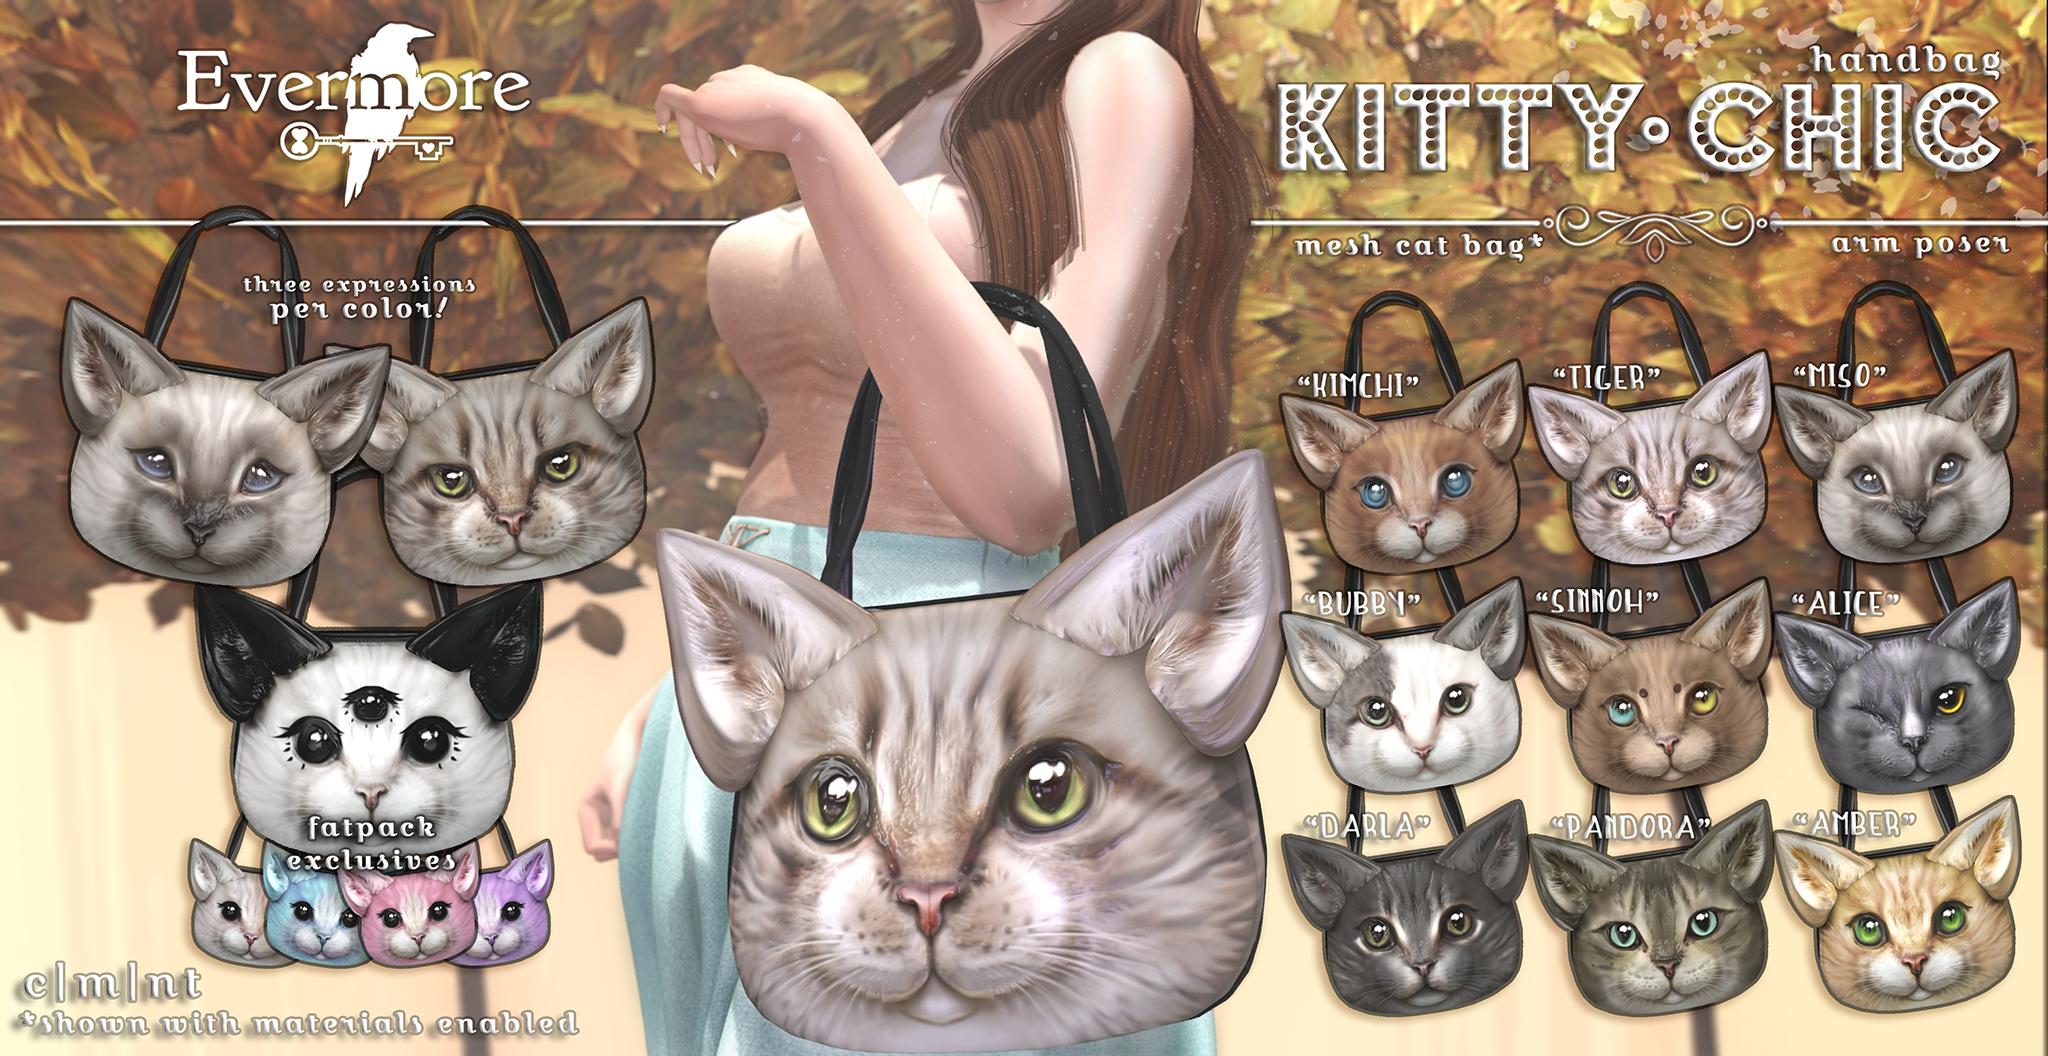 Evermore - Kitty Chic Handbag.png